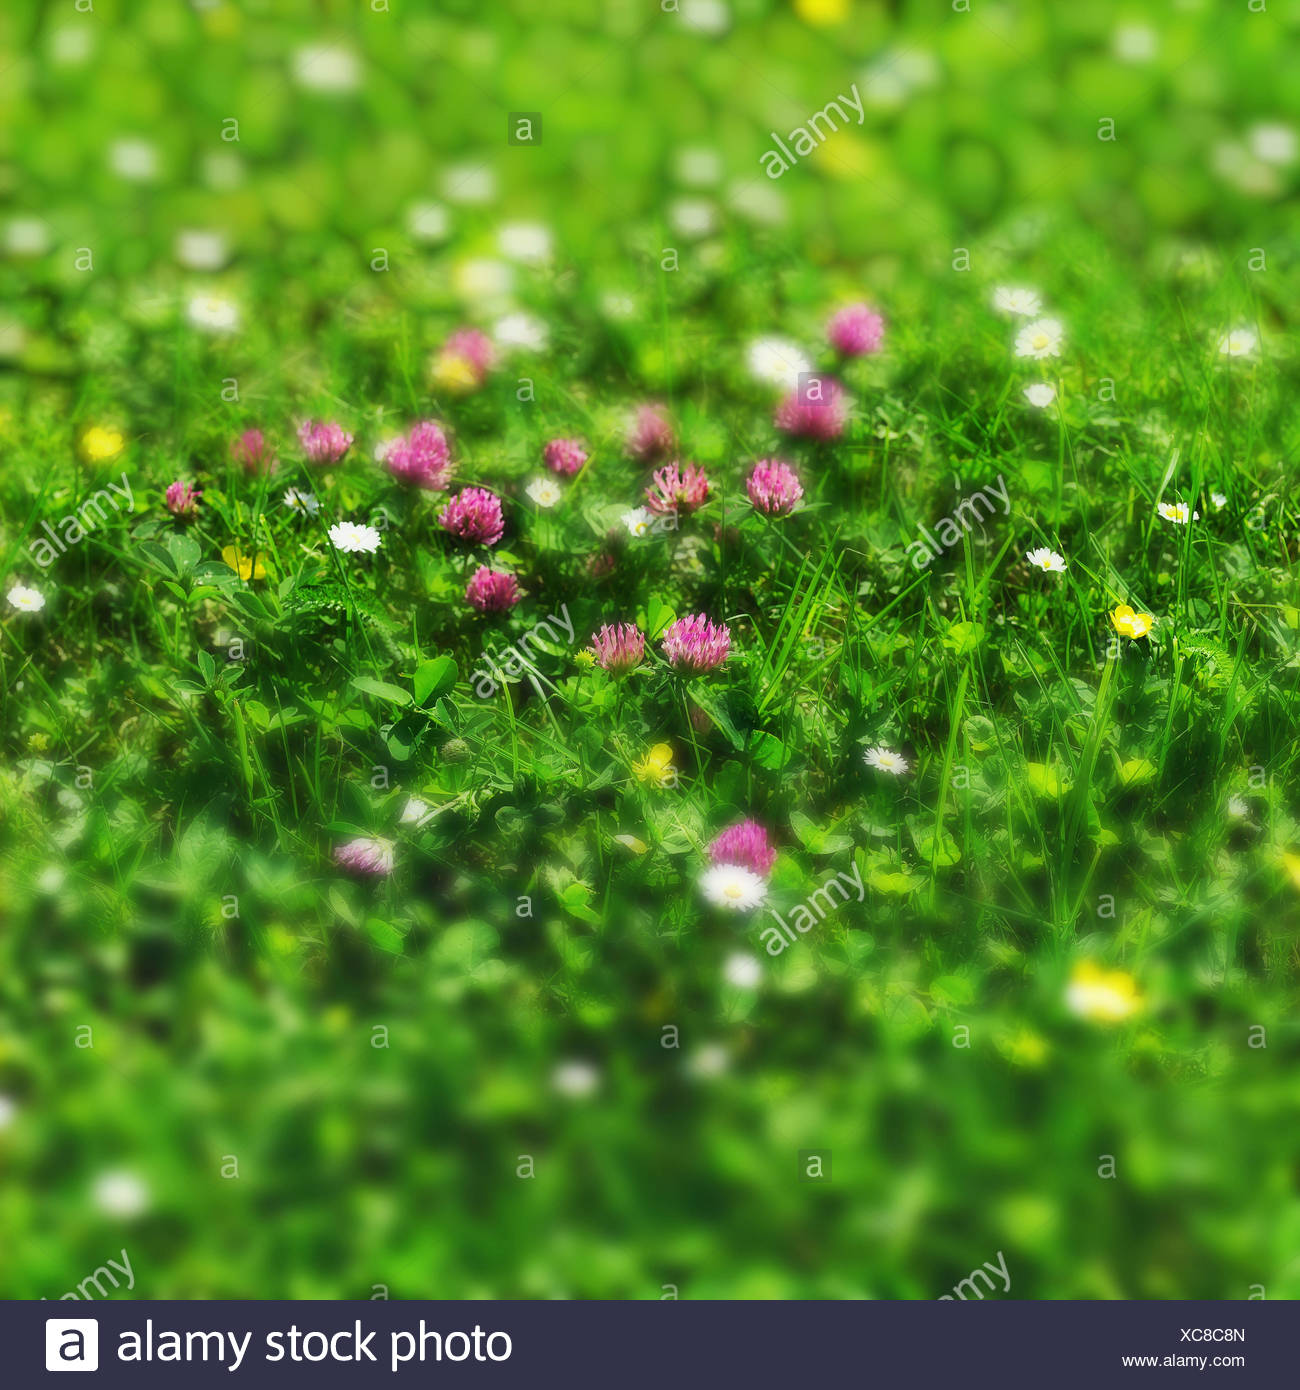 Pre Detail De Trefle Trefle Pre Plantes Herbes Fleurs Trefle